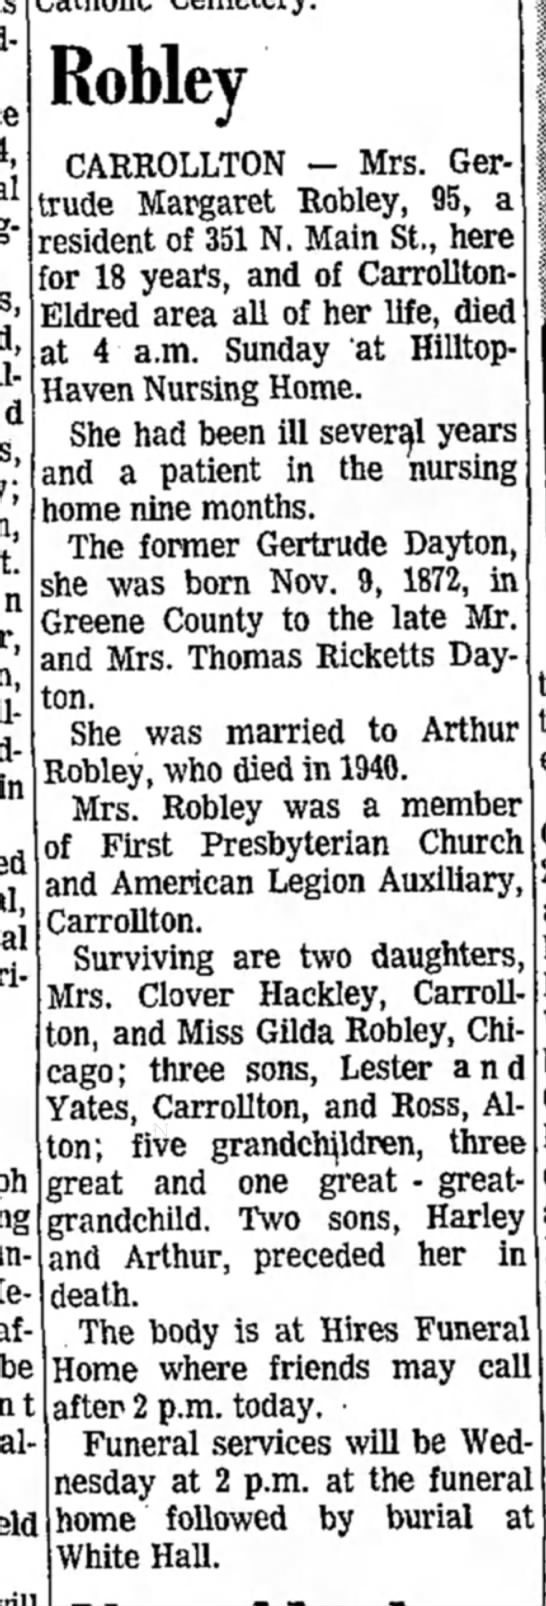 Gertrude Robley-obit-Alton Evening News-page 17-2 Jan 1968 -